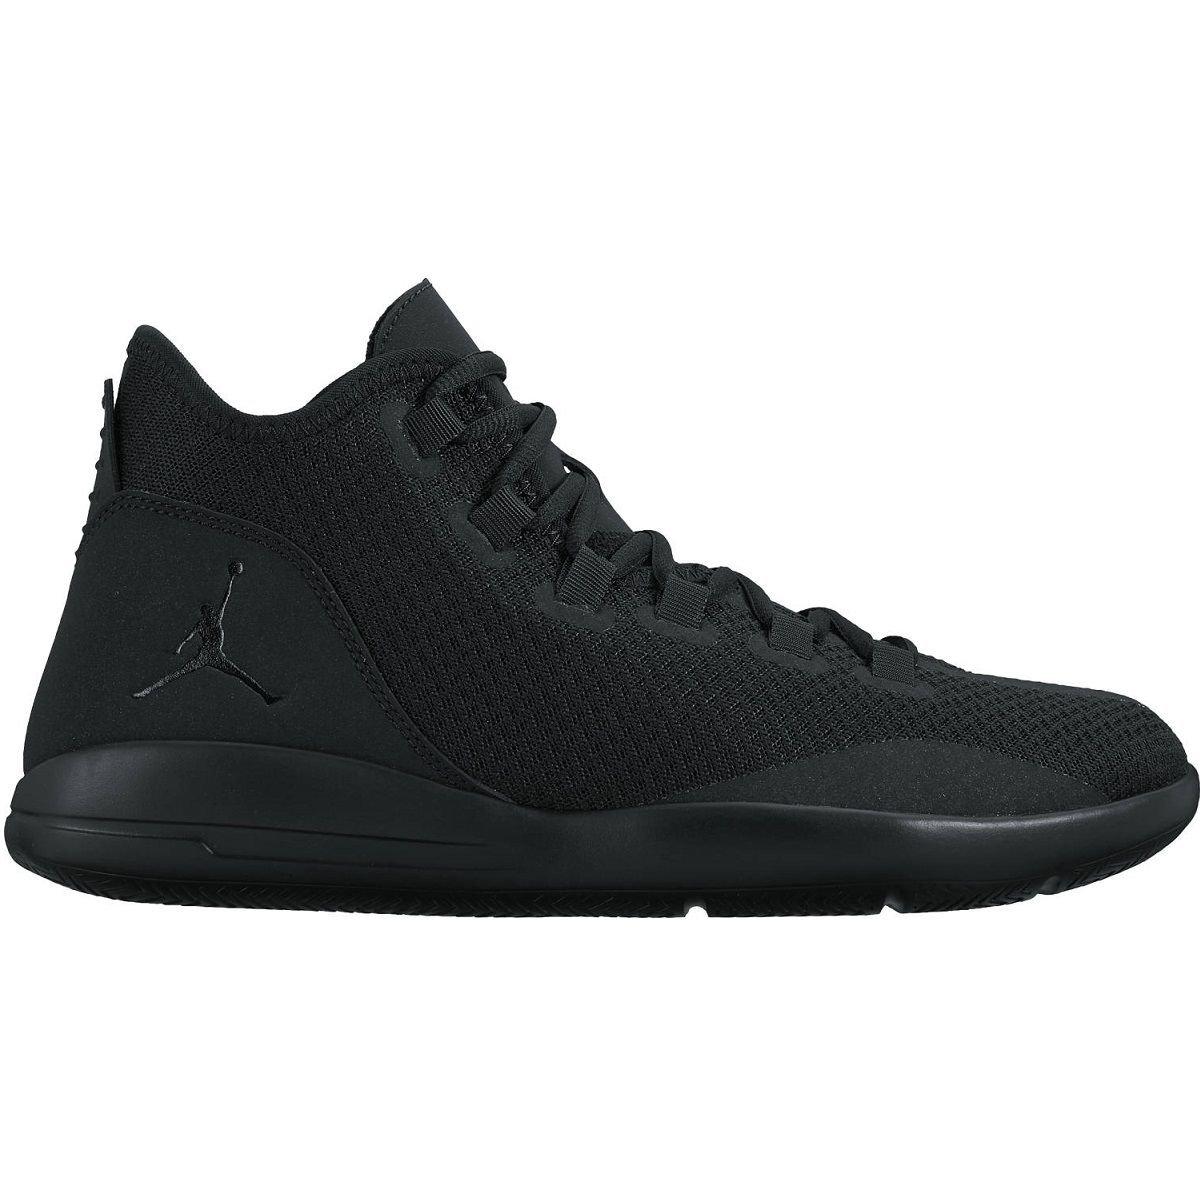 31bfdb2485e Galleon - Nike Mens Jordan Reveal Basketball Shoe